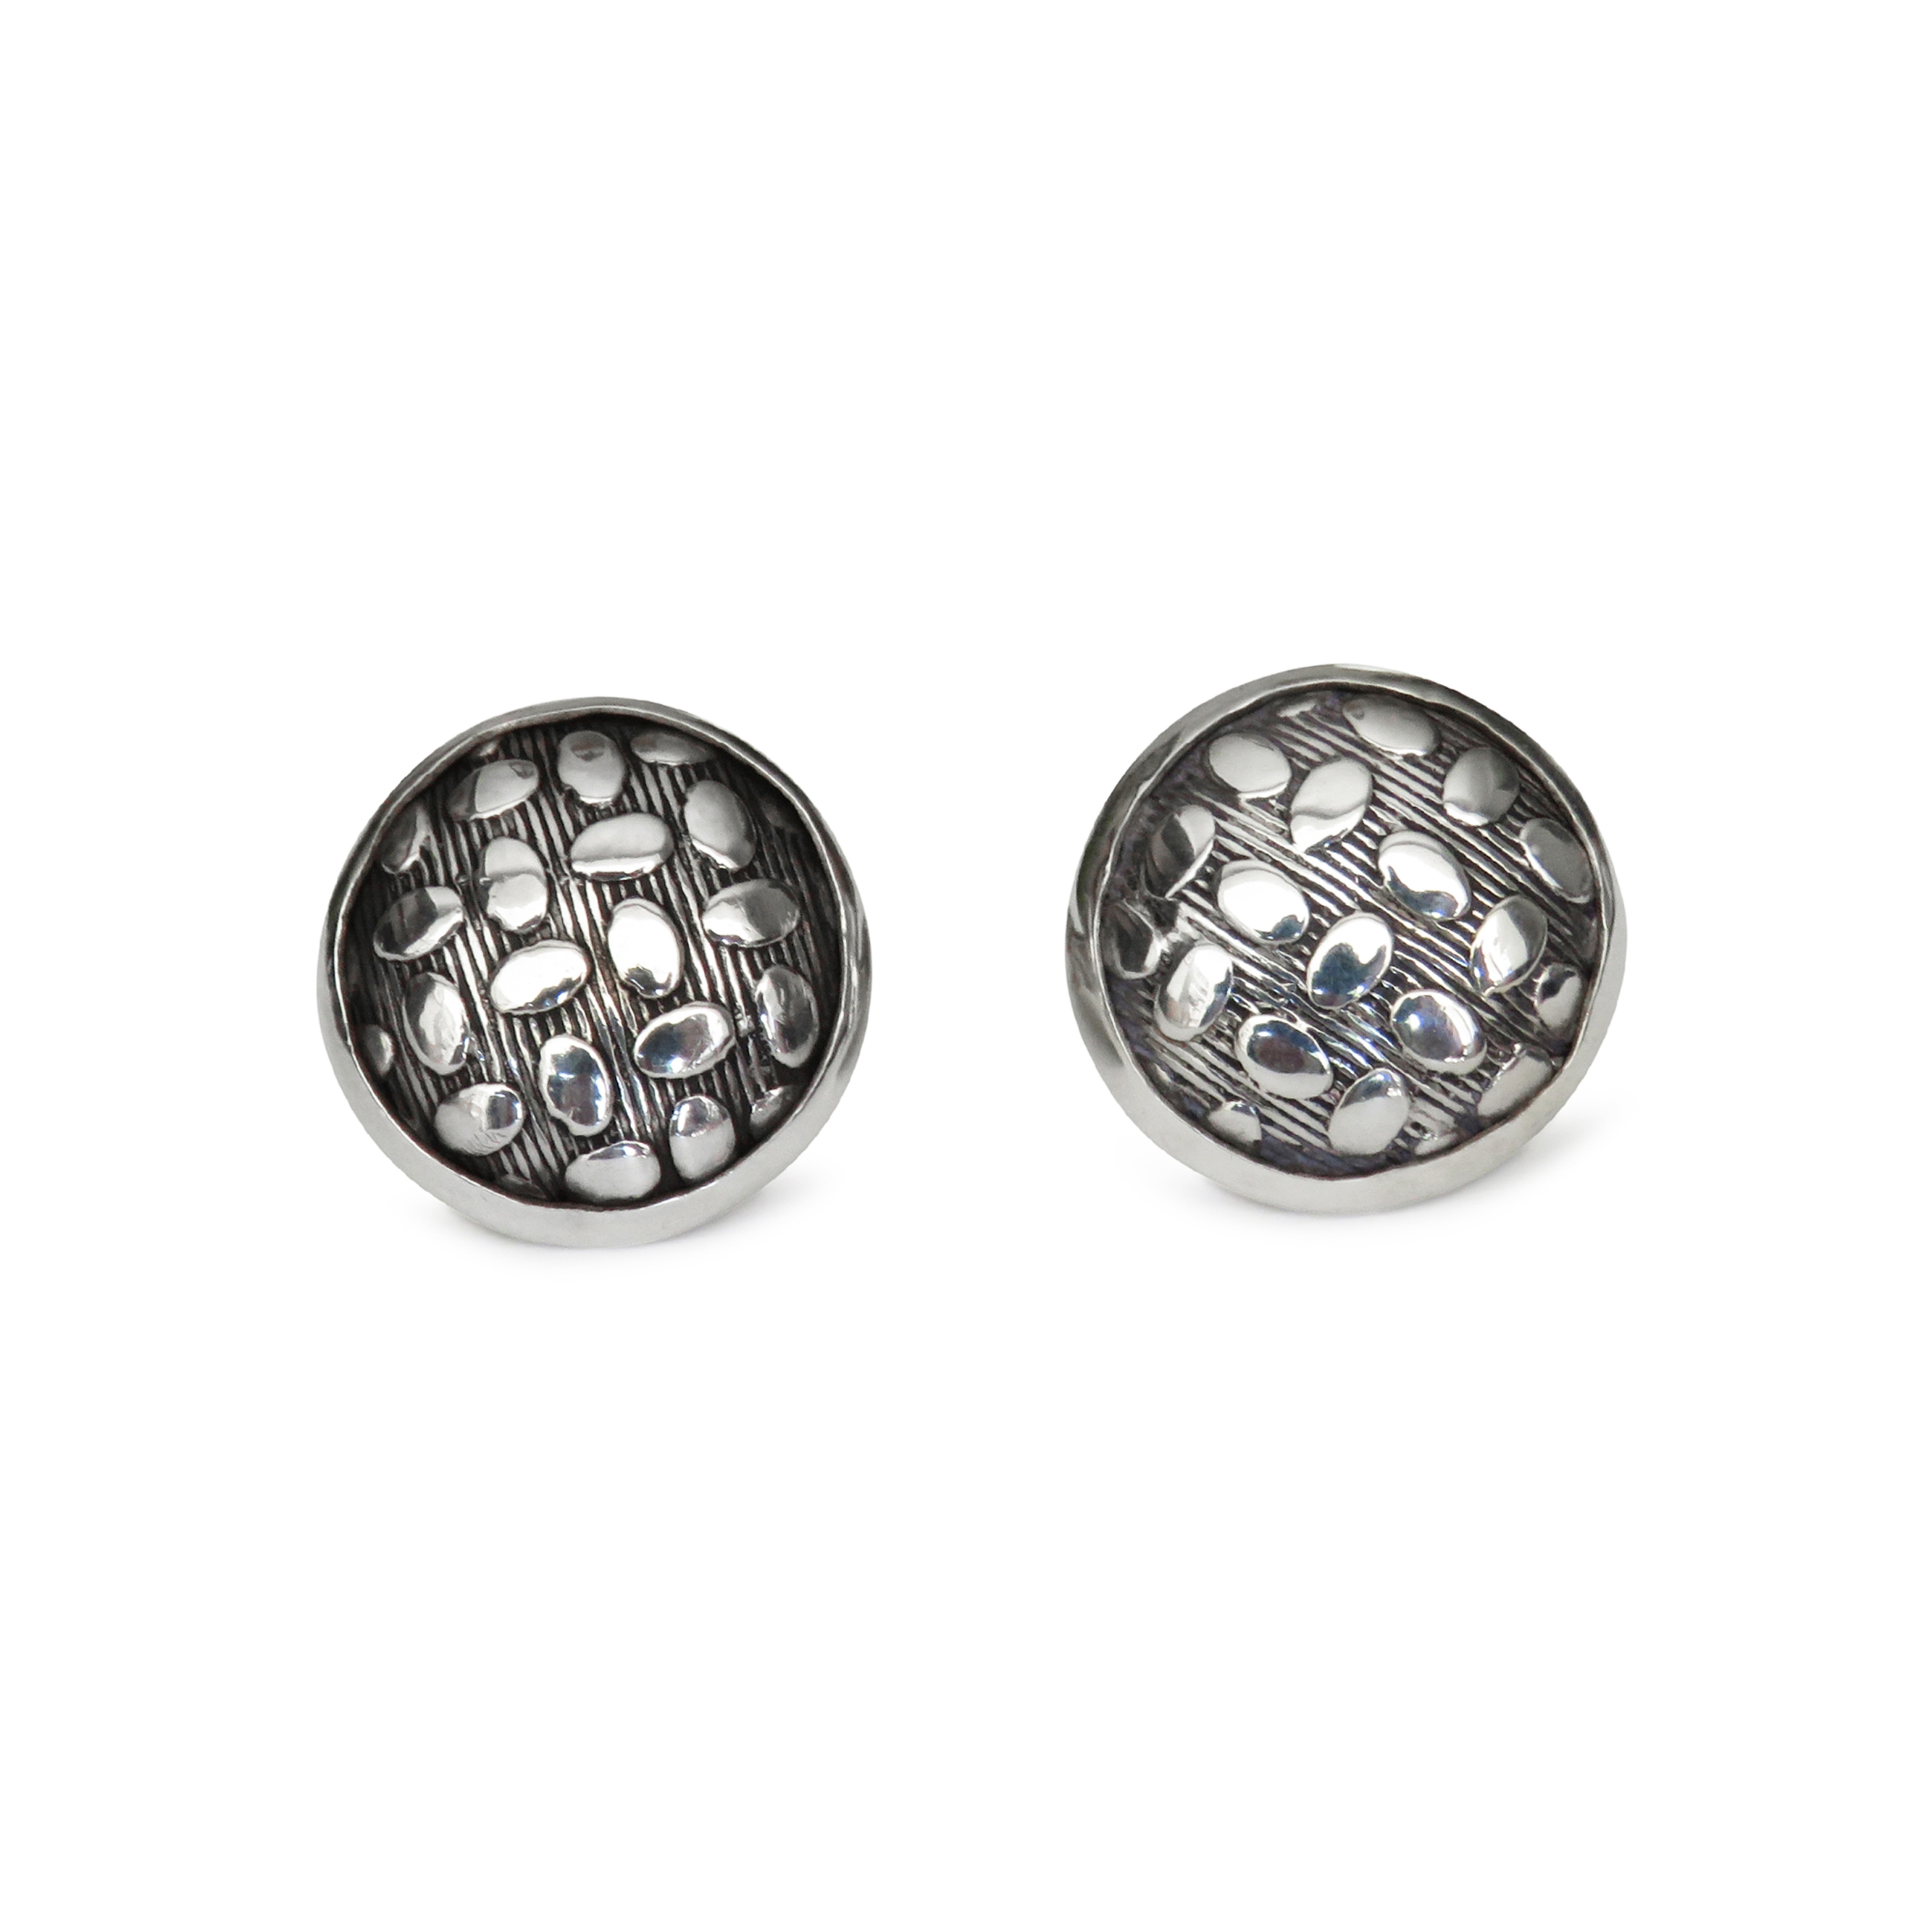 ISABEL ENGLEBERT Pebble Silver Cufflinks